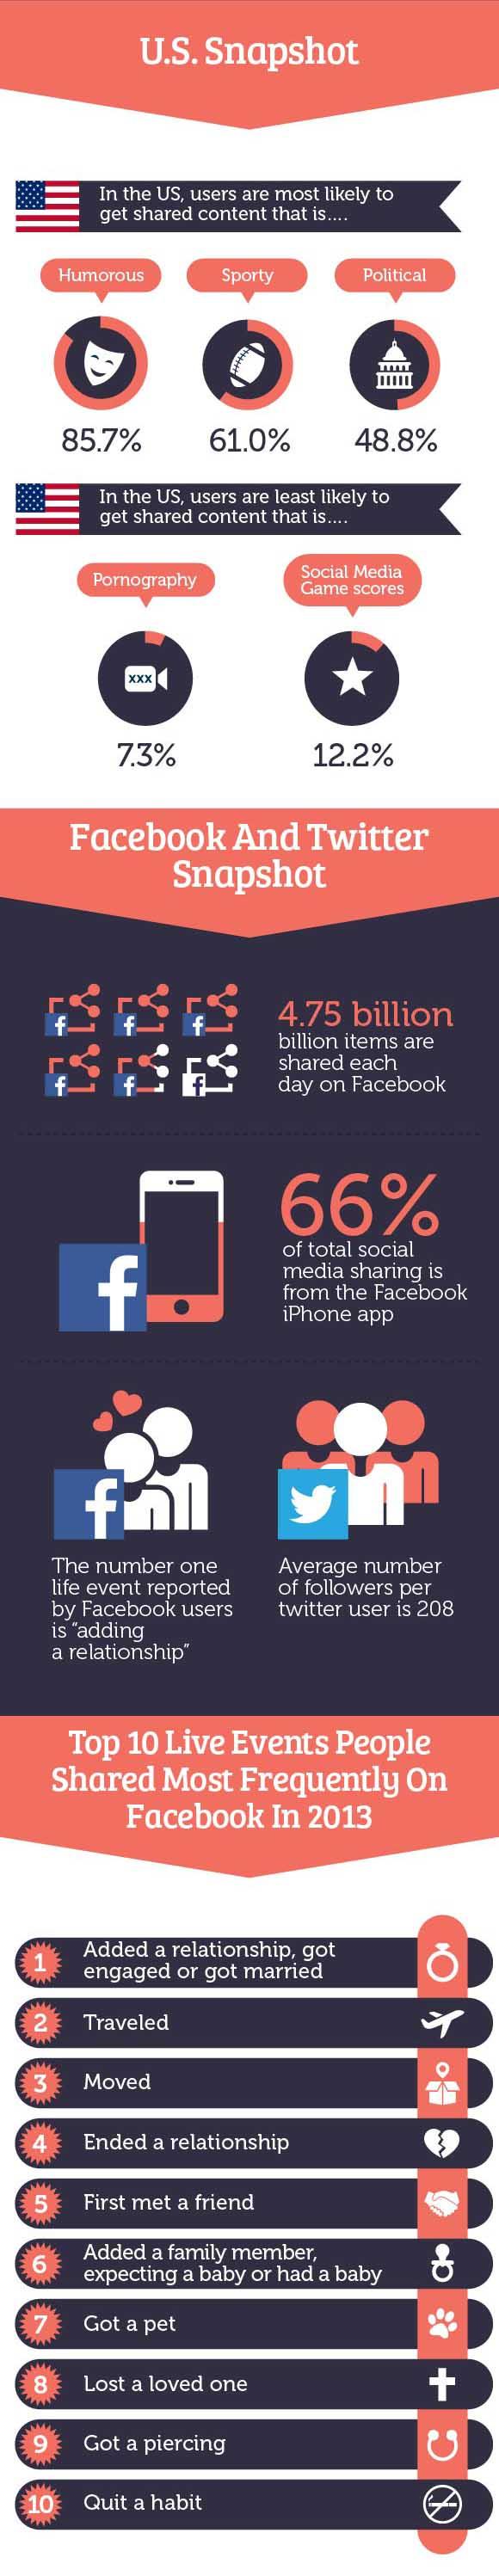 contenidos redes sociales mas compartidos